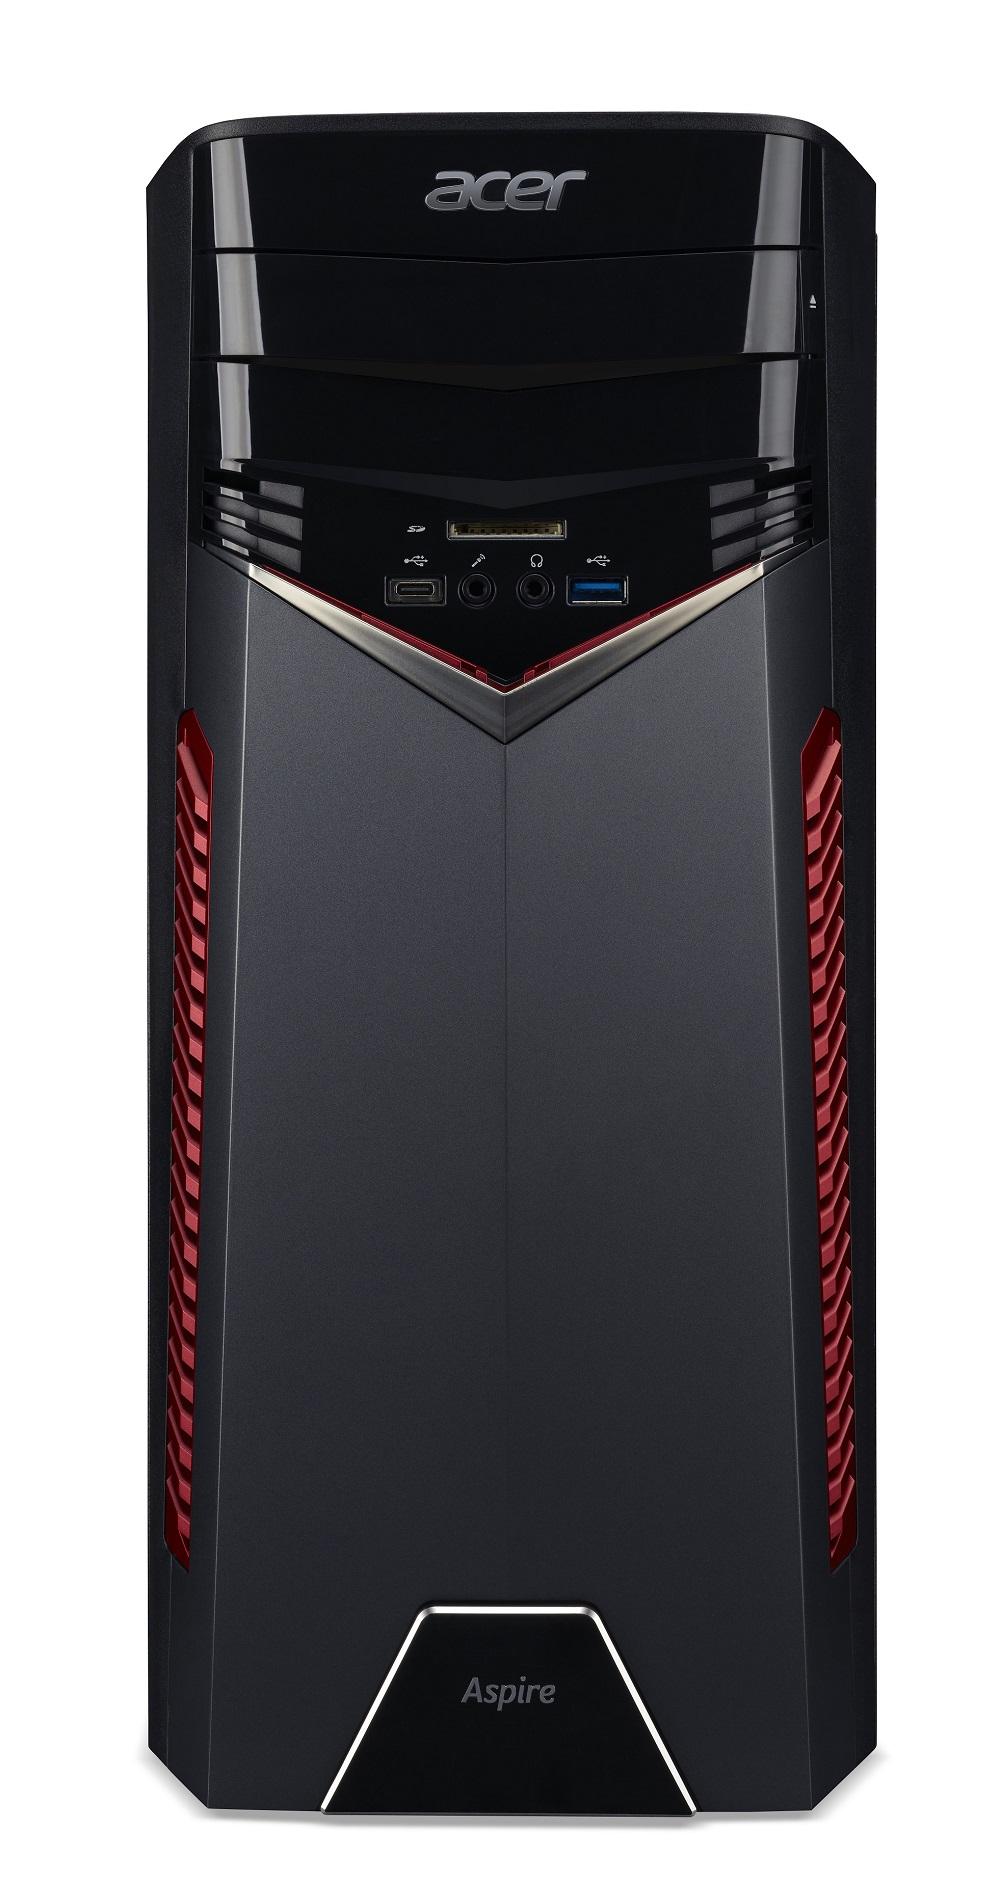 Acer Aspire GX-781/i5-7400/8GB/128GB SSD+1TB 7200 ot./GTX 1060 3GB/DVDRW/klávesnice a myš/WiFi 802.11ac/card reader/W10 Home